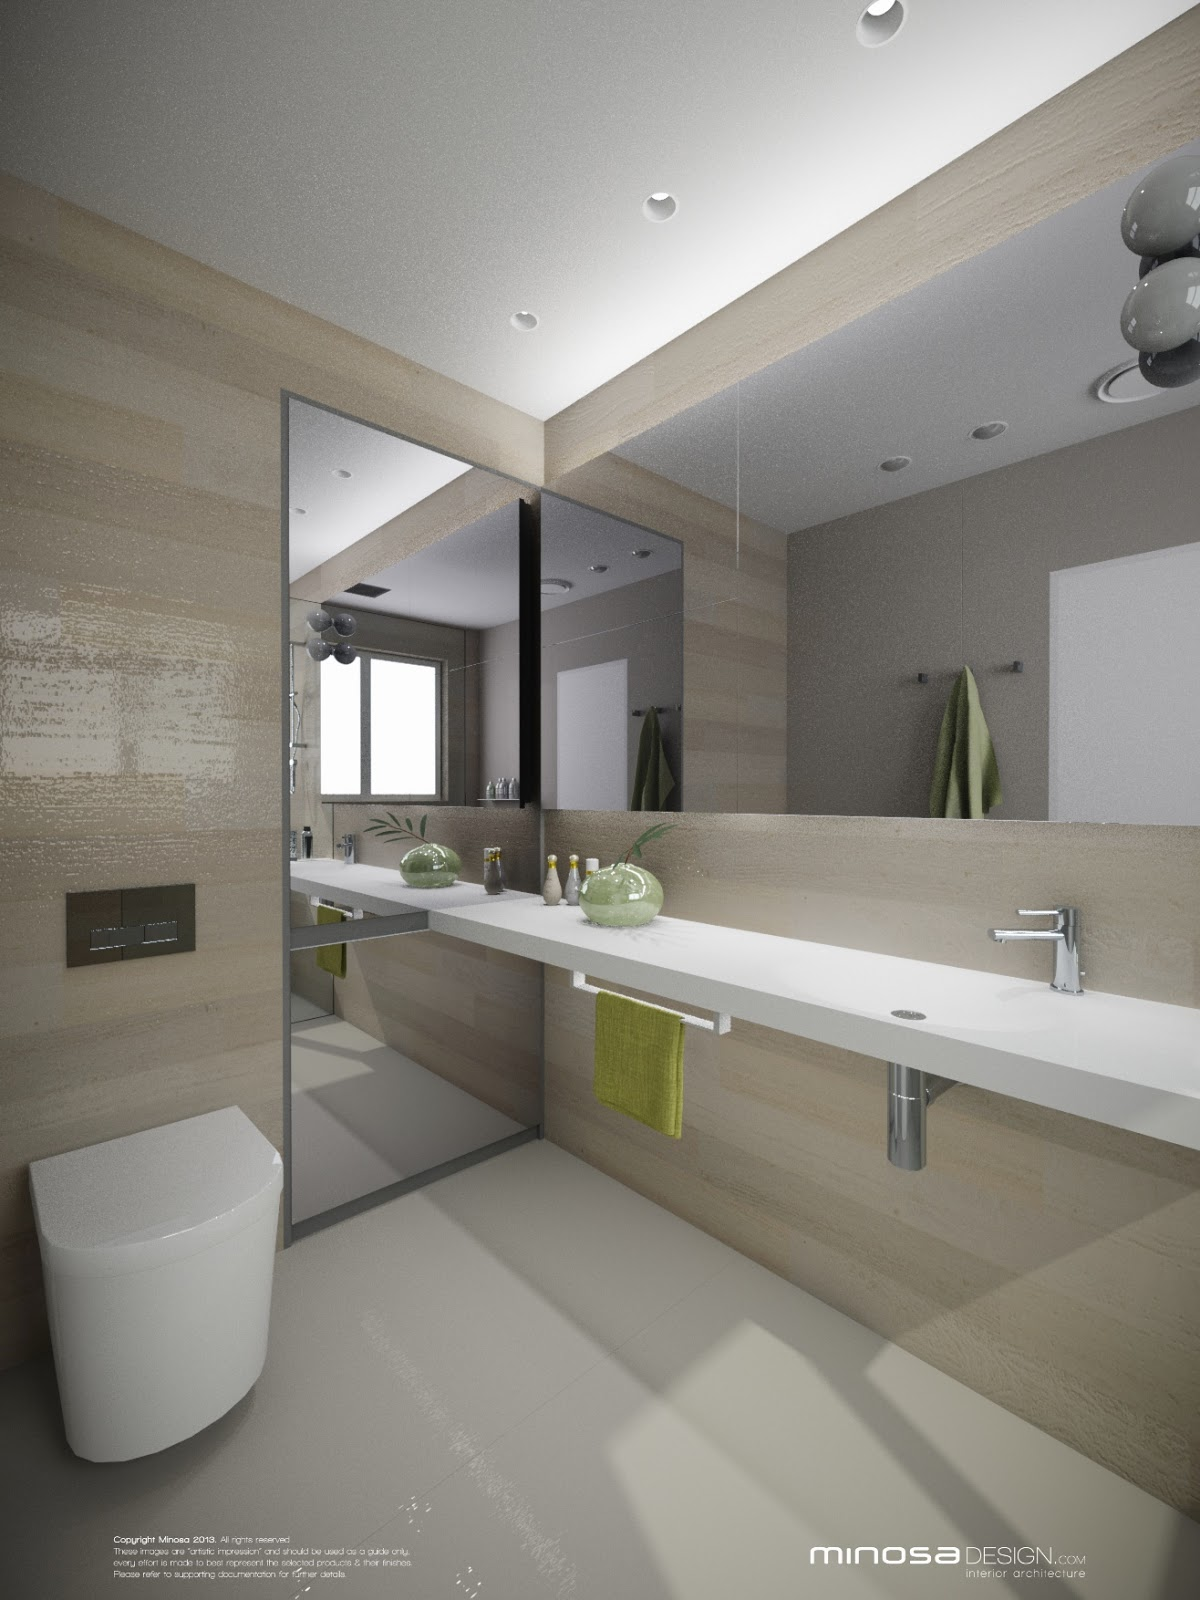 Minosa: Bringing Sexy Back - The Modern Bathroom